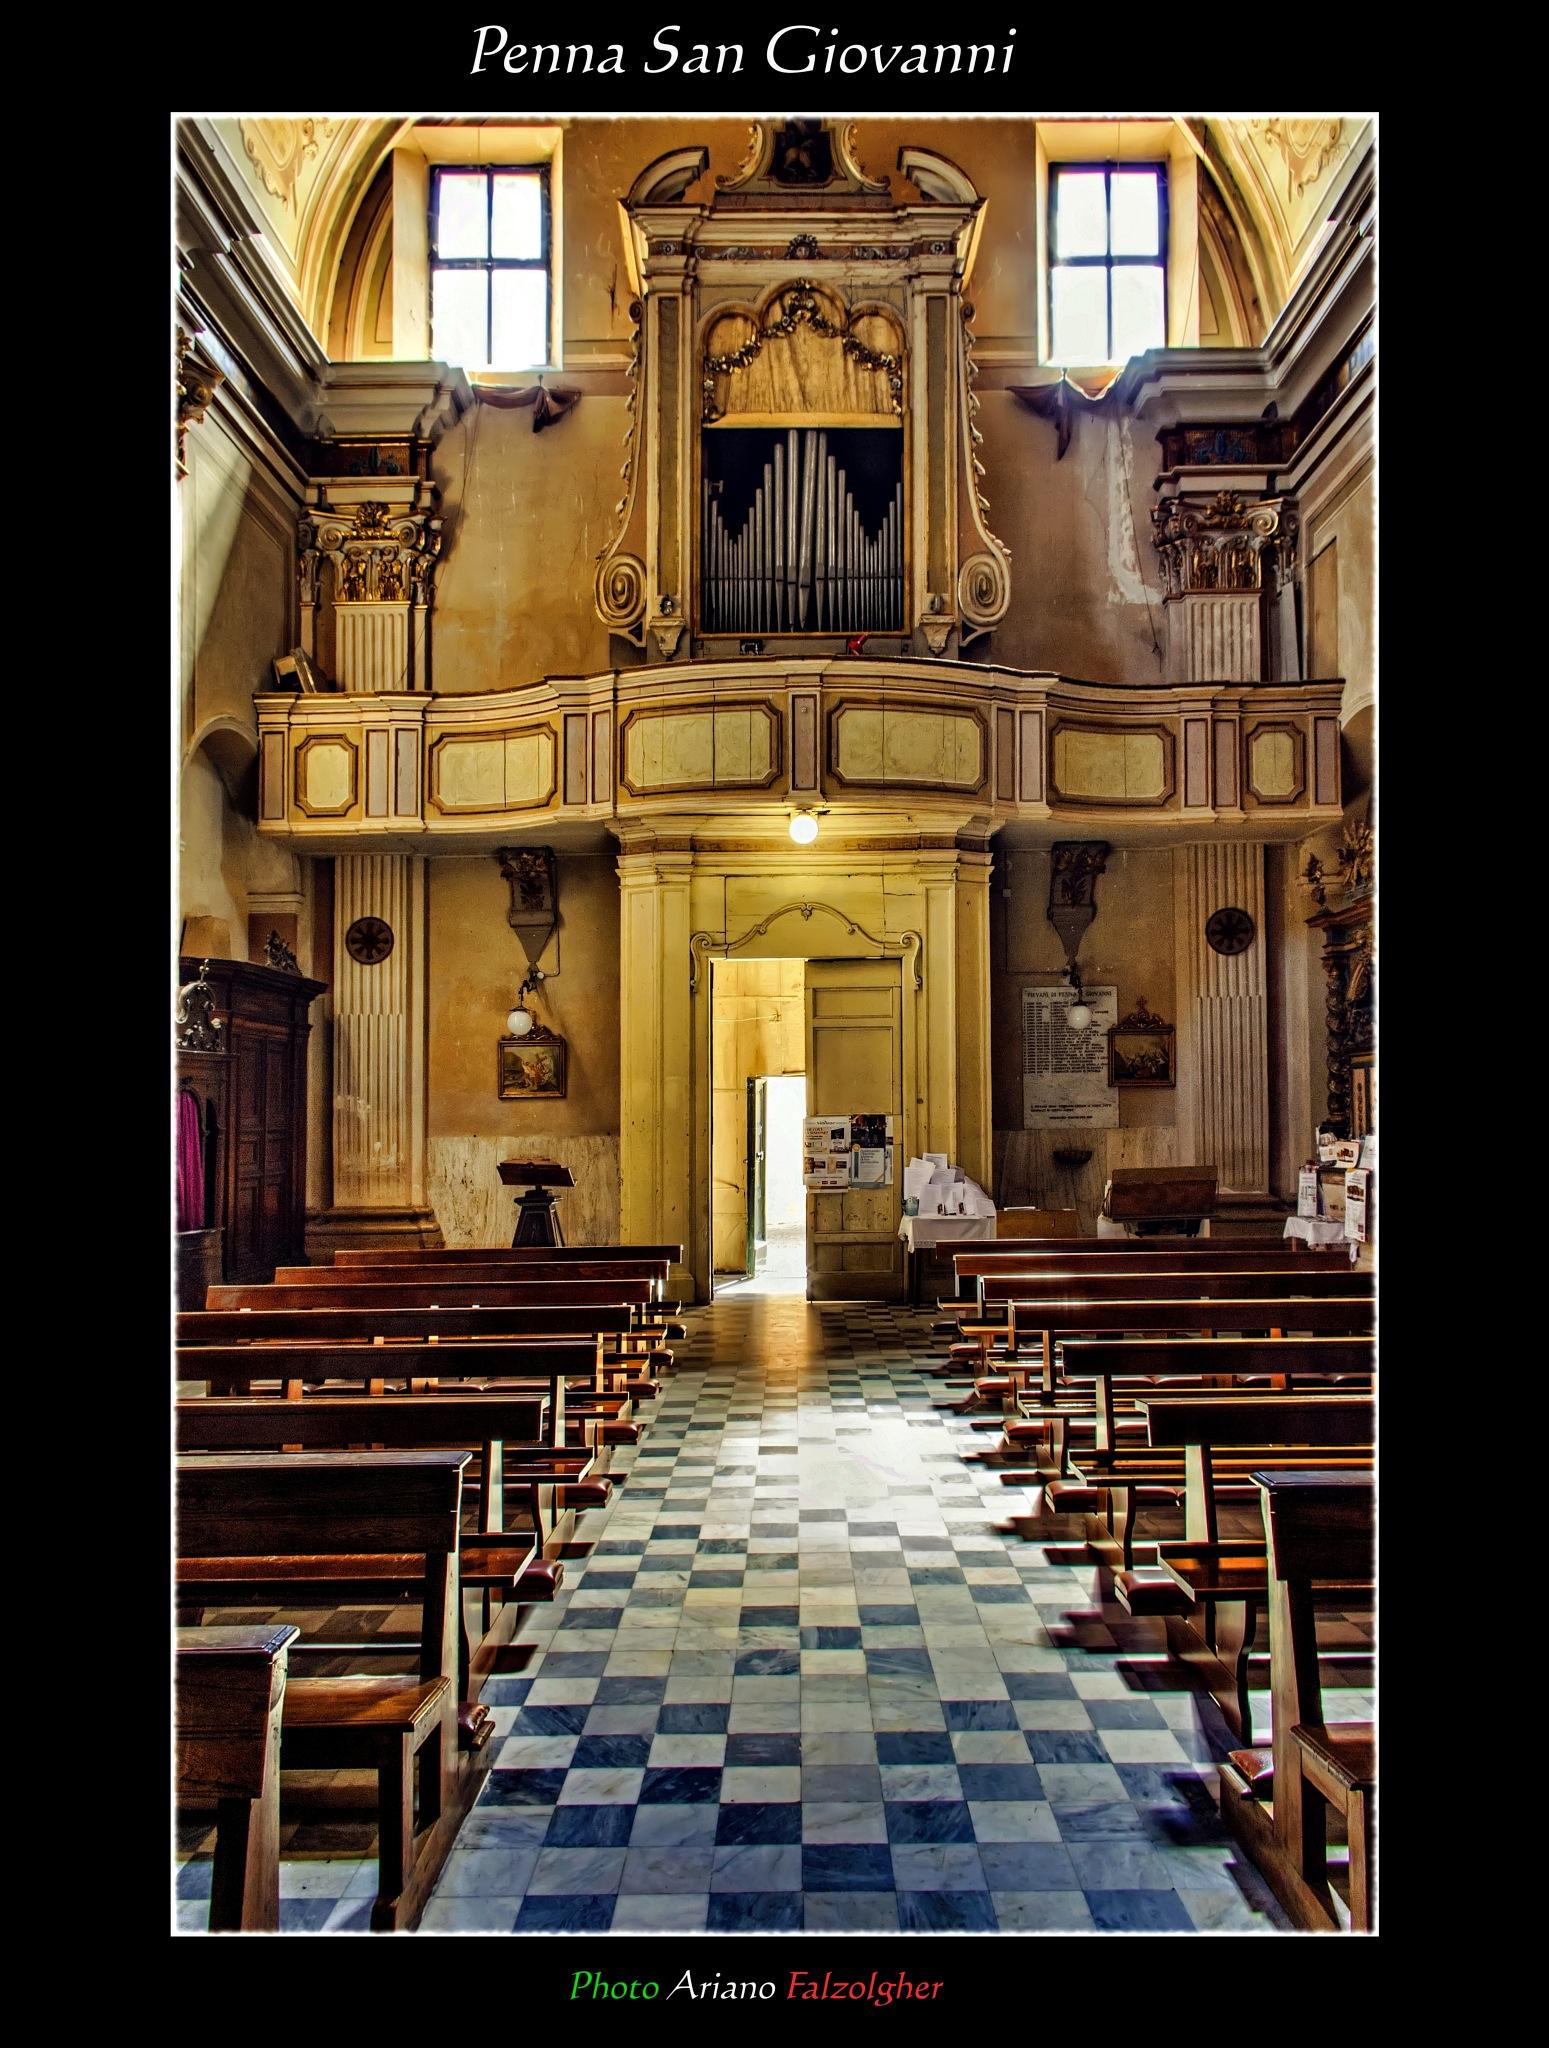 Penna San Giovanni by Ariano Falzolgher